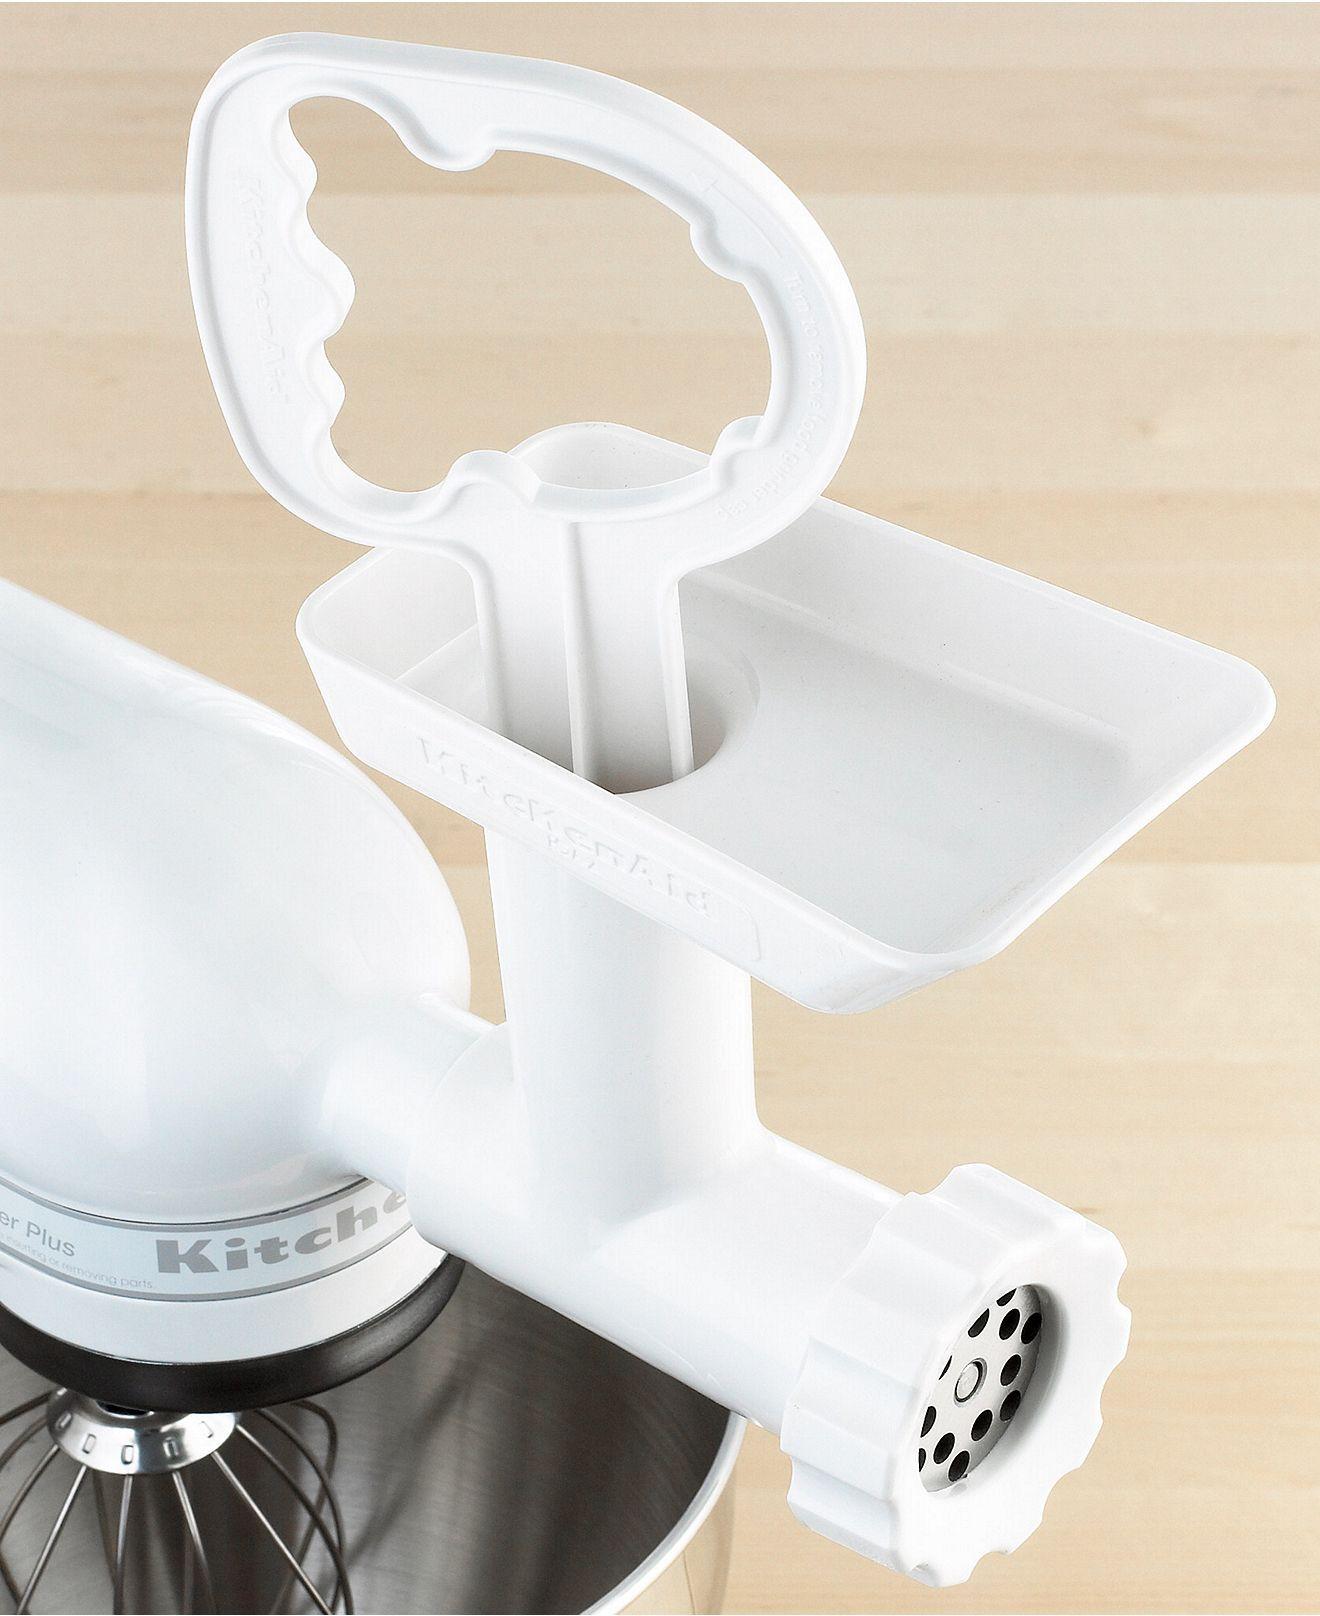 Daily grind 6000 kitchenaid fga stand mixer attachment